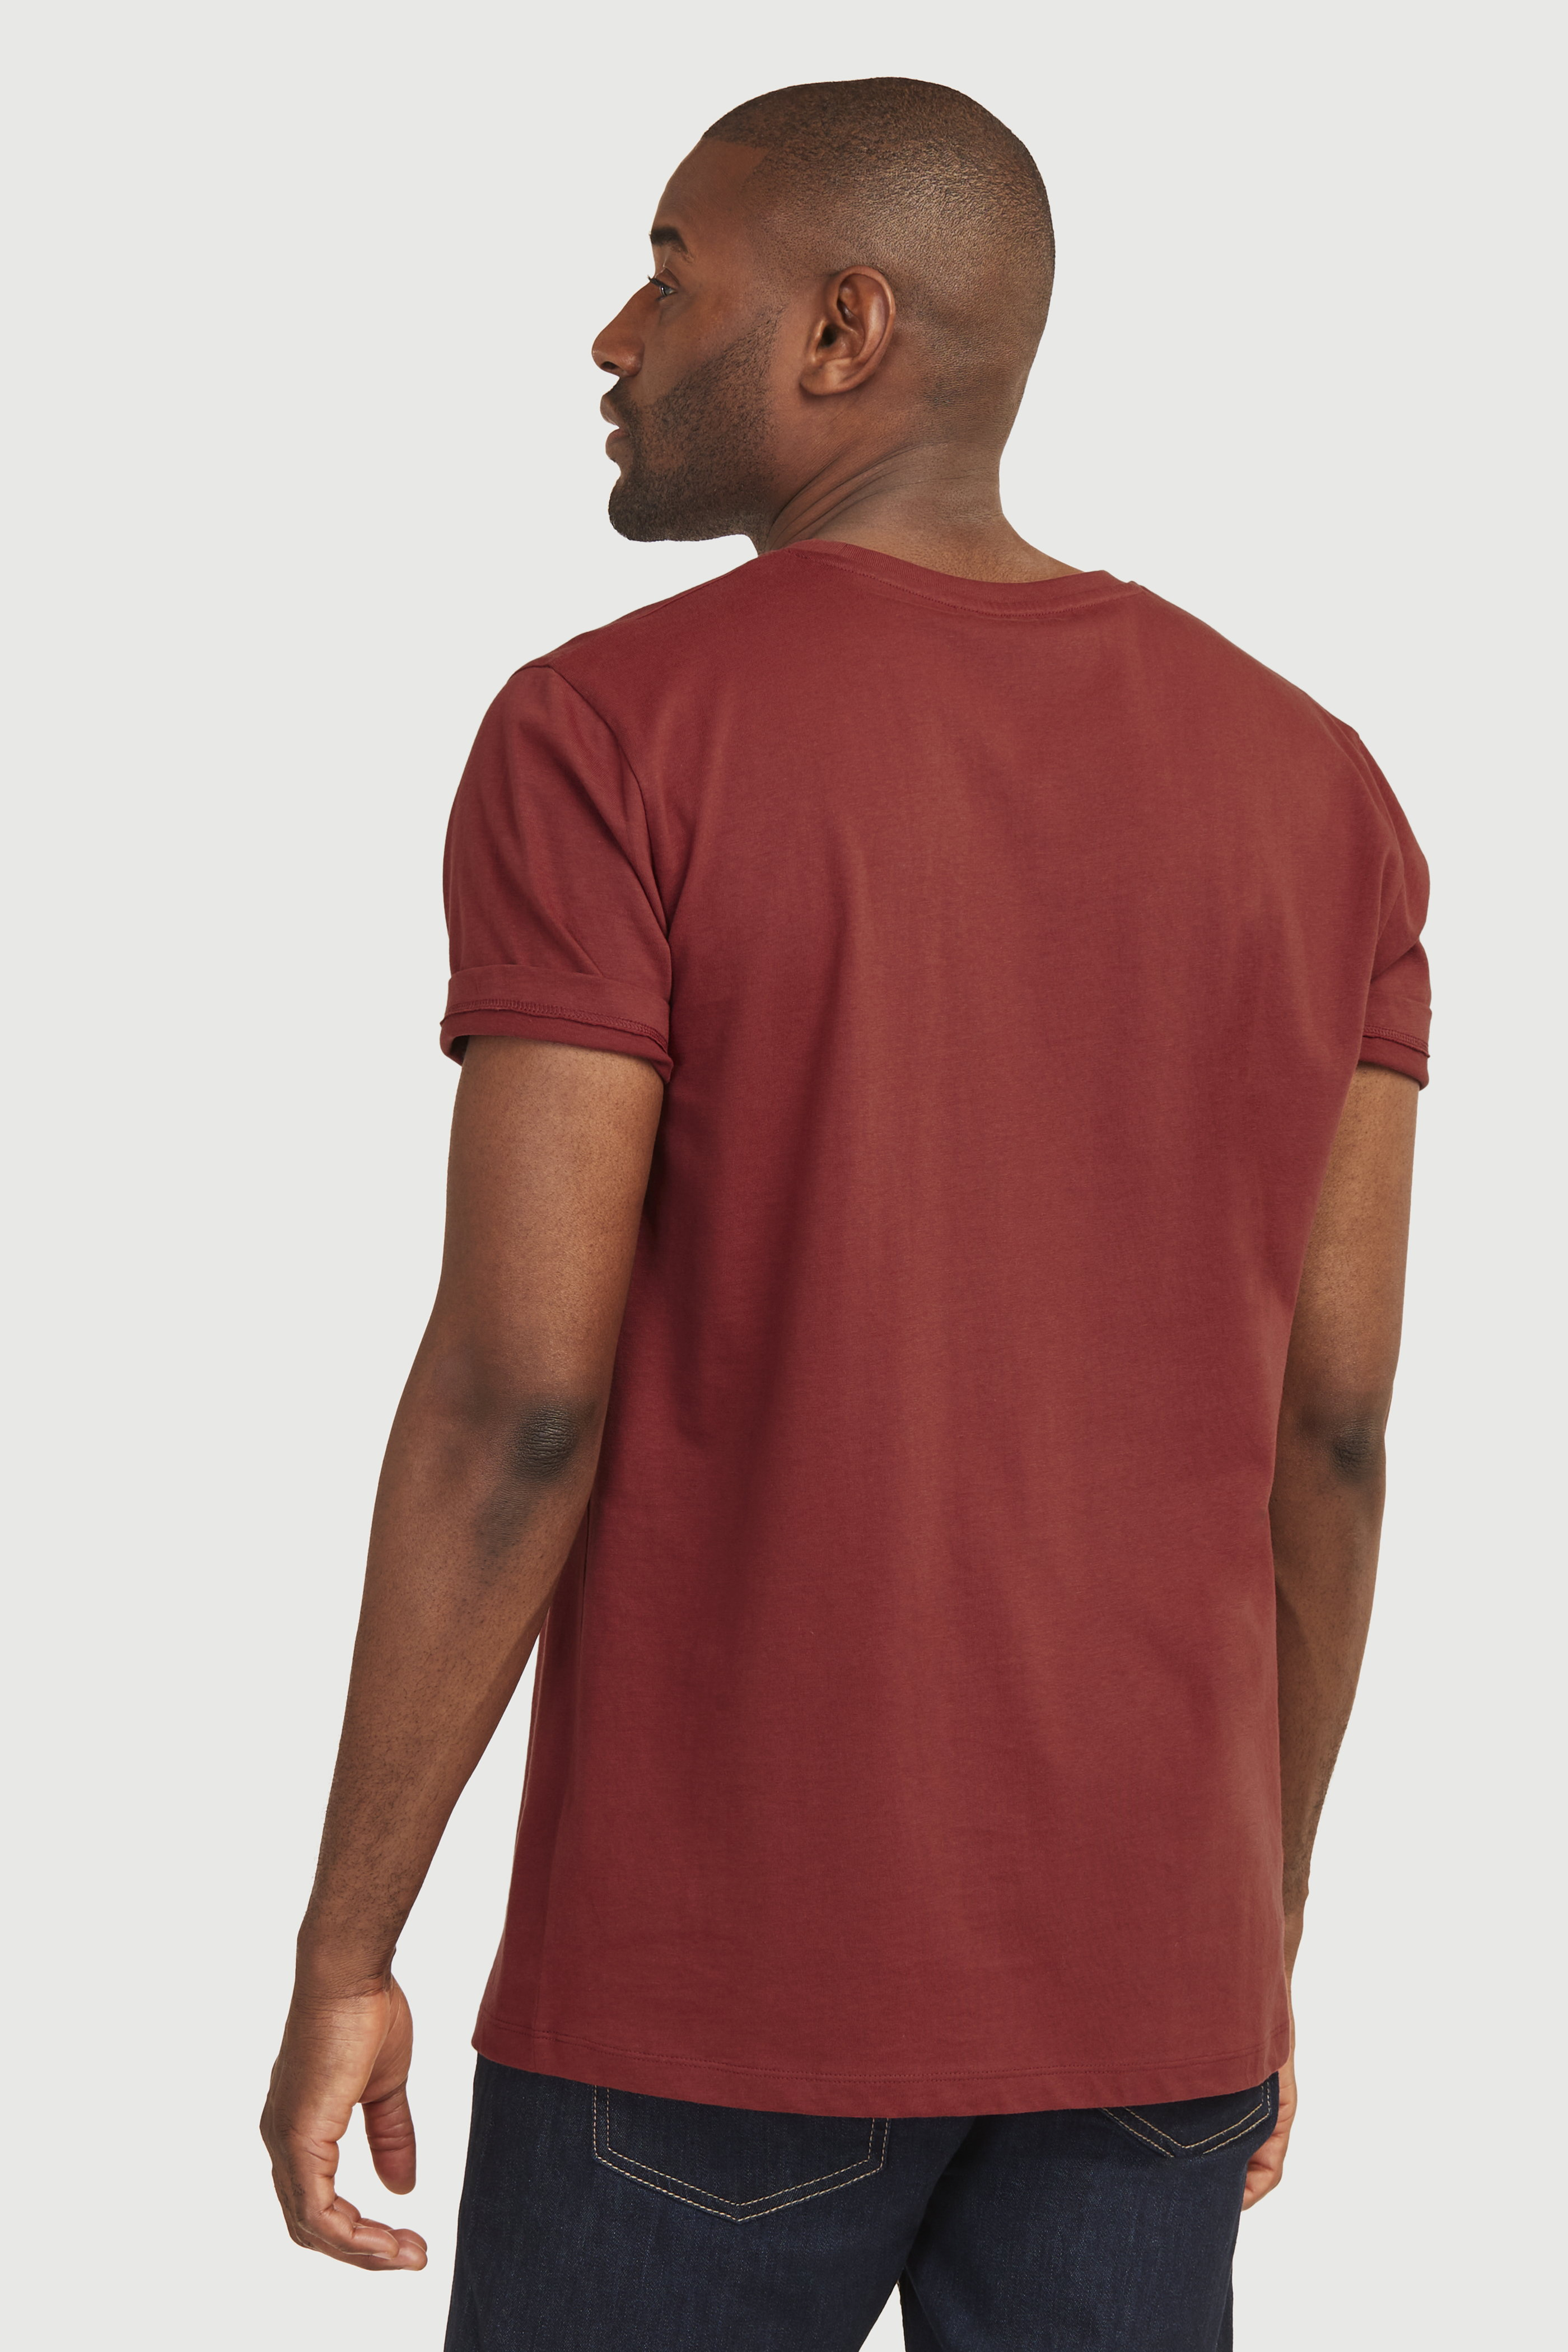 Mugav trikotaažist t-särk